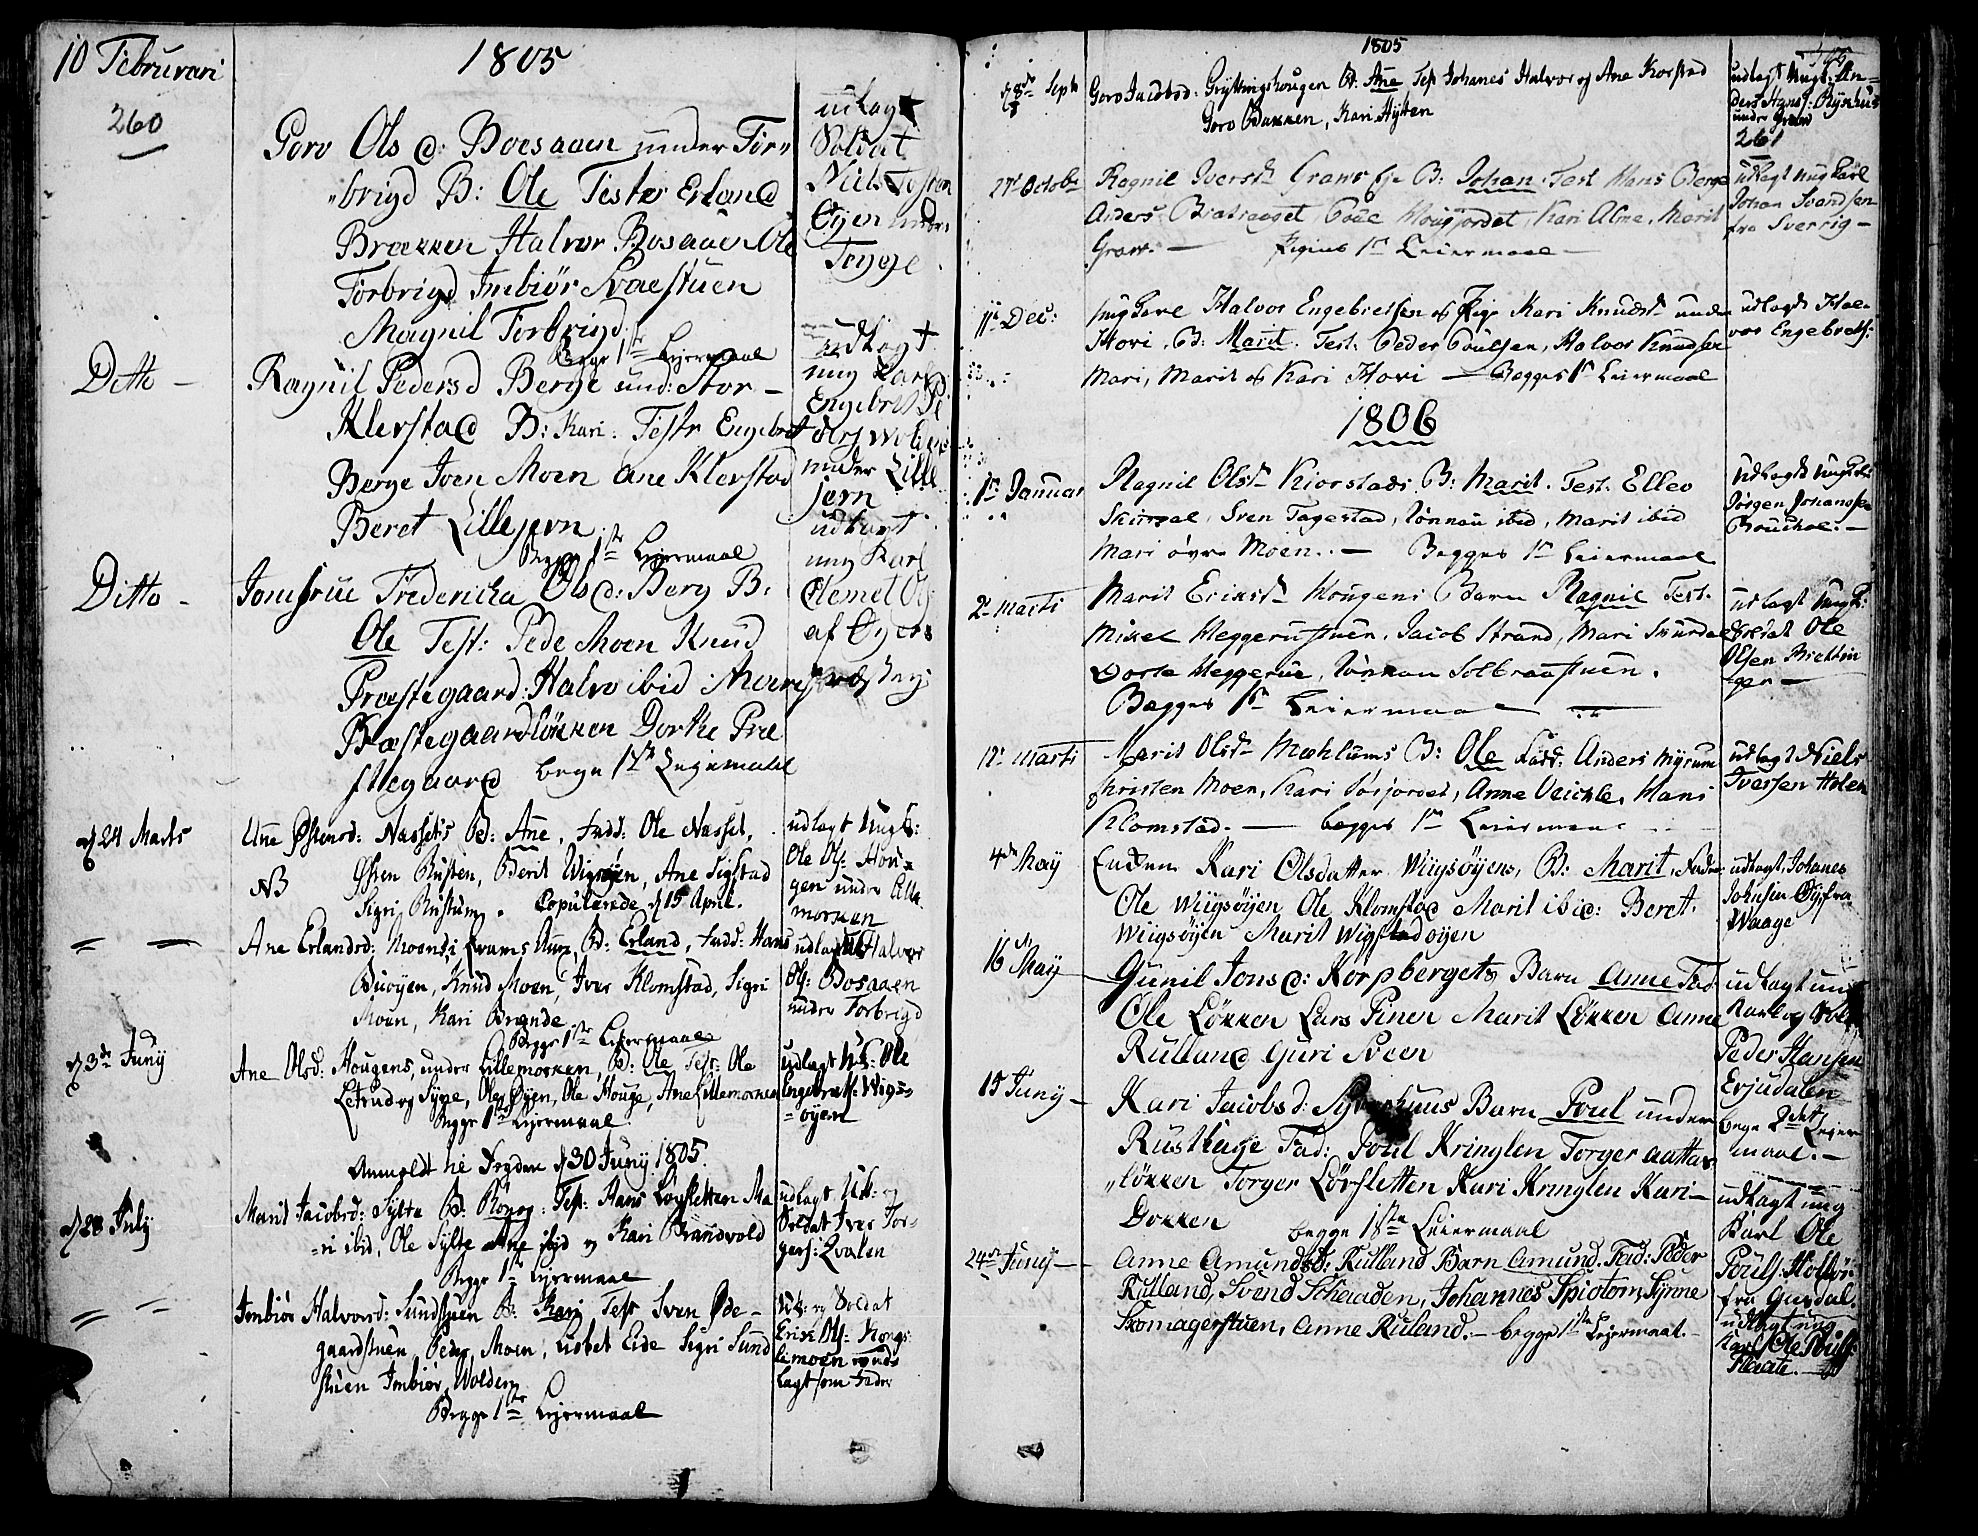 SAH, Fron prestekontor, H/Ha/Haa/L0001: Ministerialbok nr. 1, 1799-1816, s. 260-261